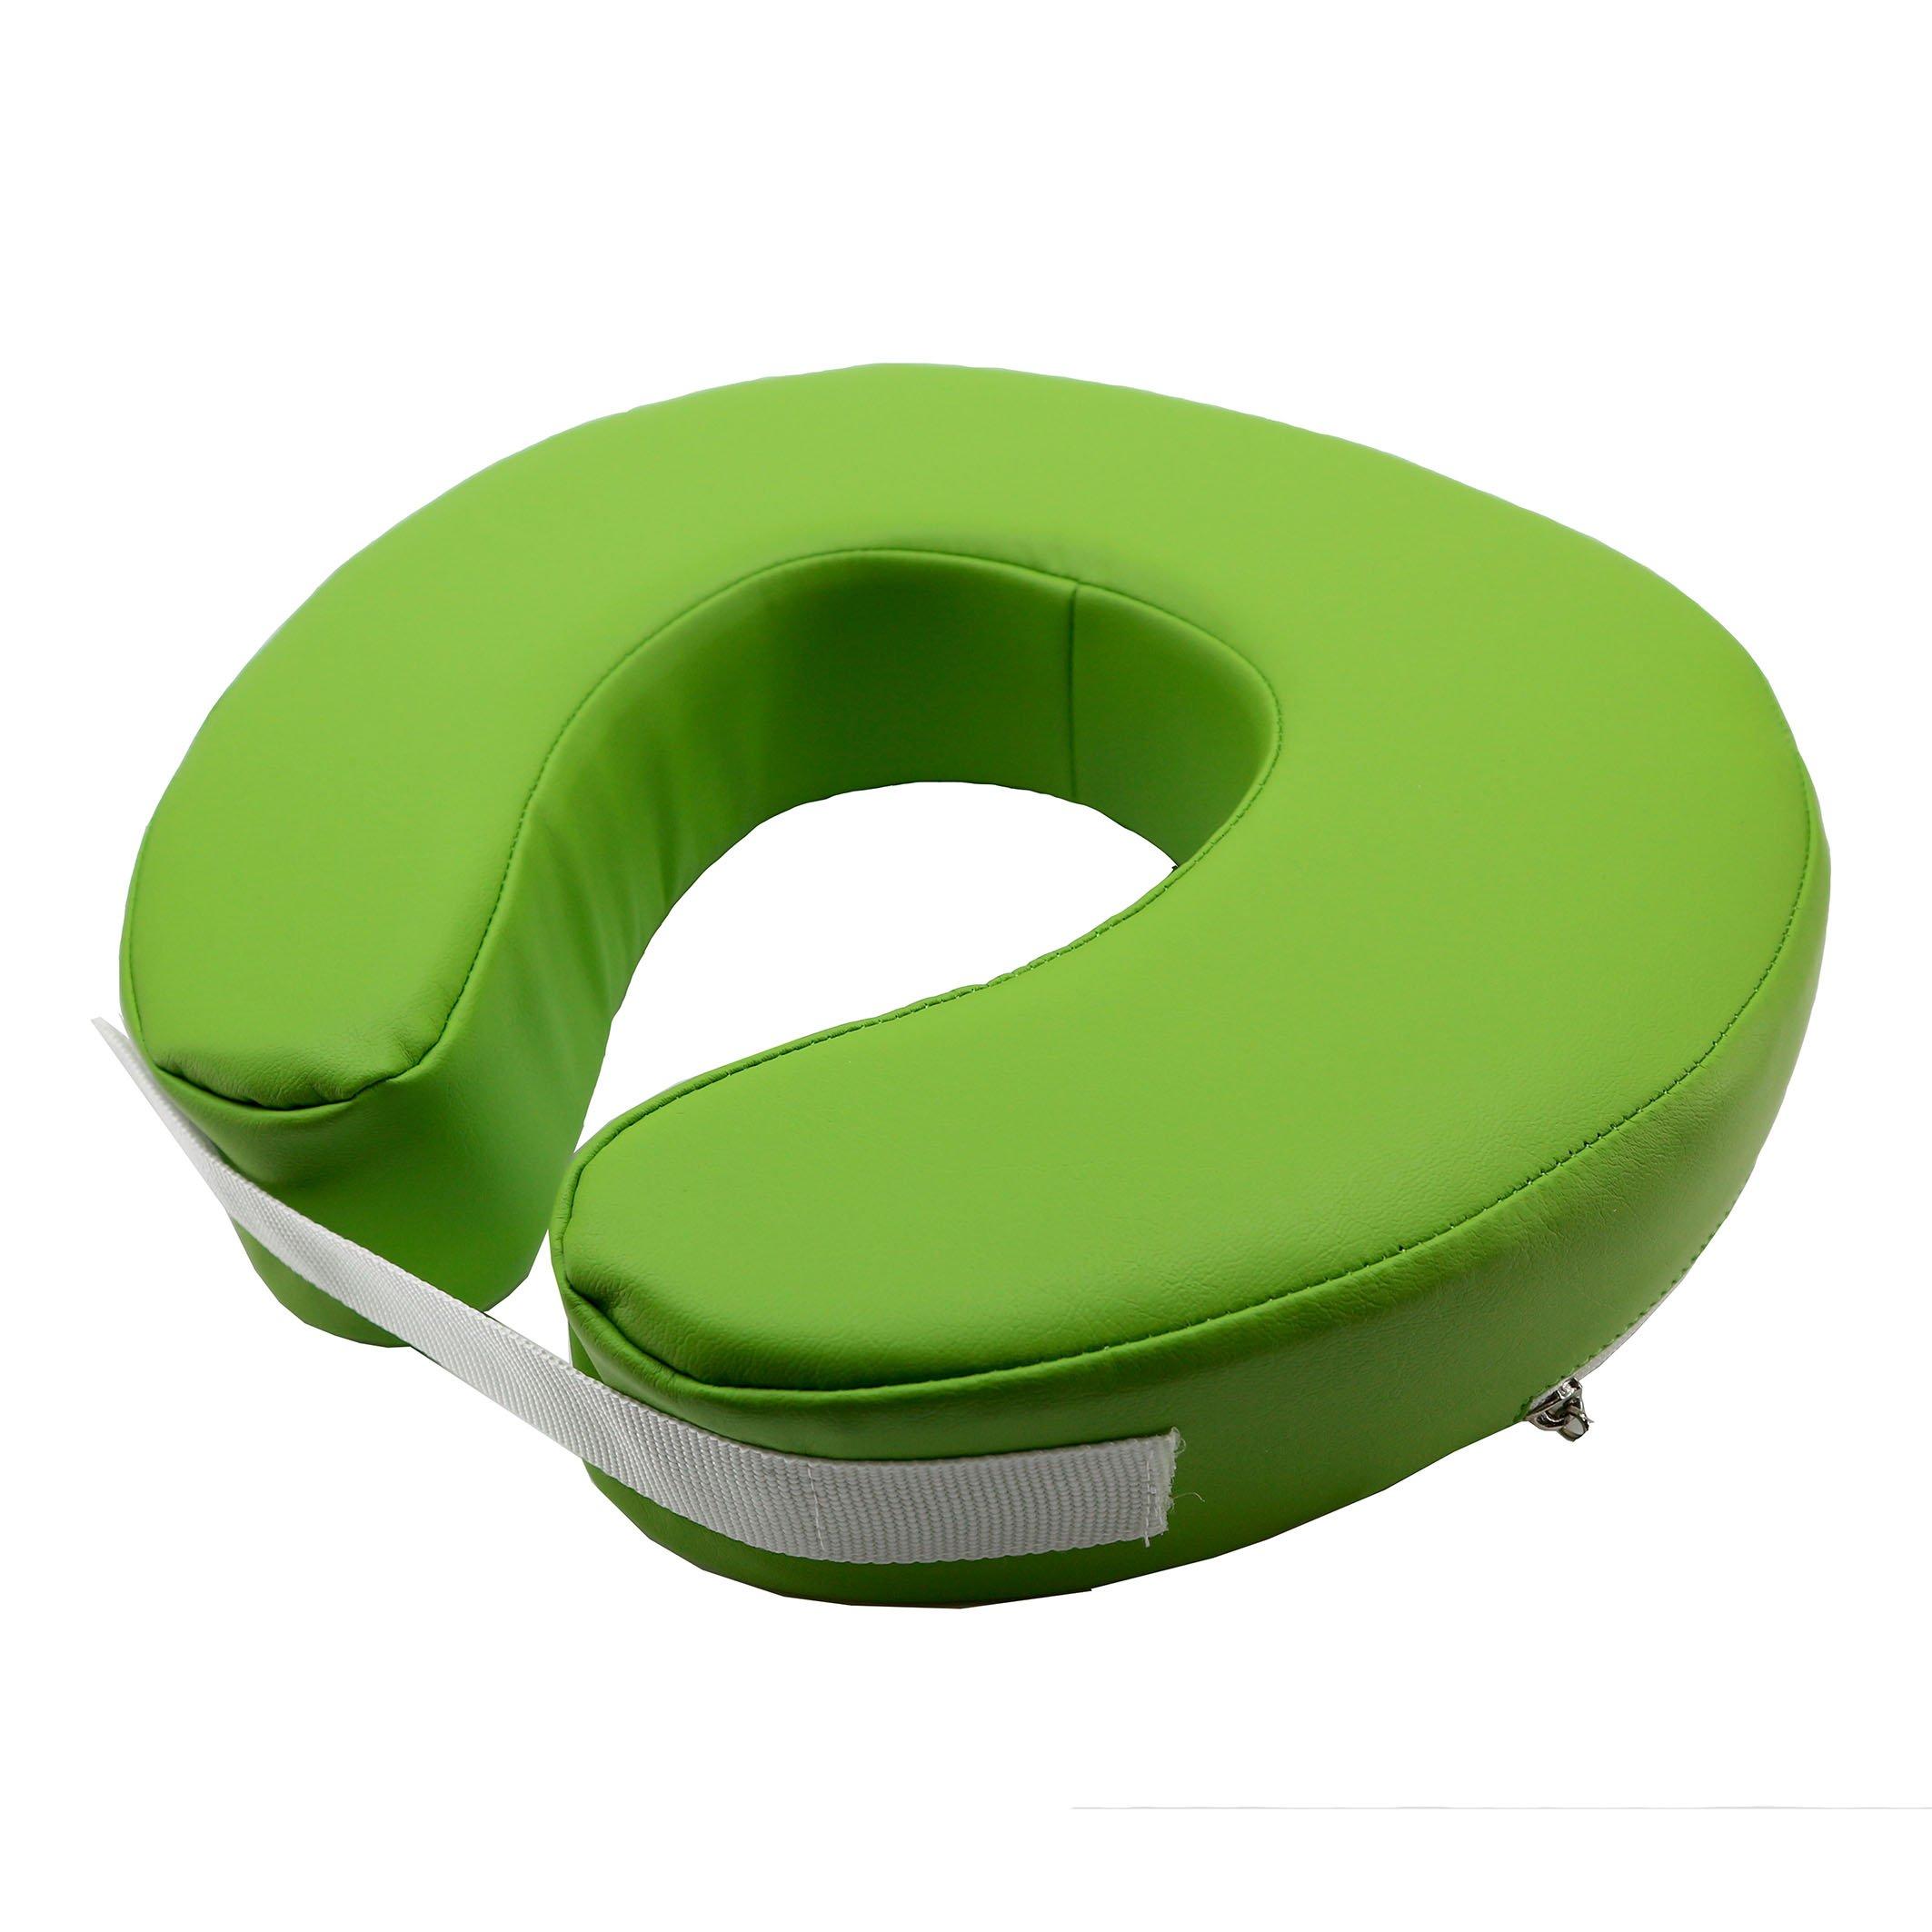 JBS Massage Fitted Crescent Face Pillow Massage Face Cradle Cushion Green